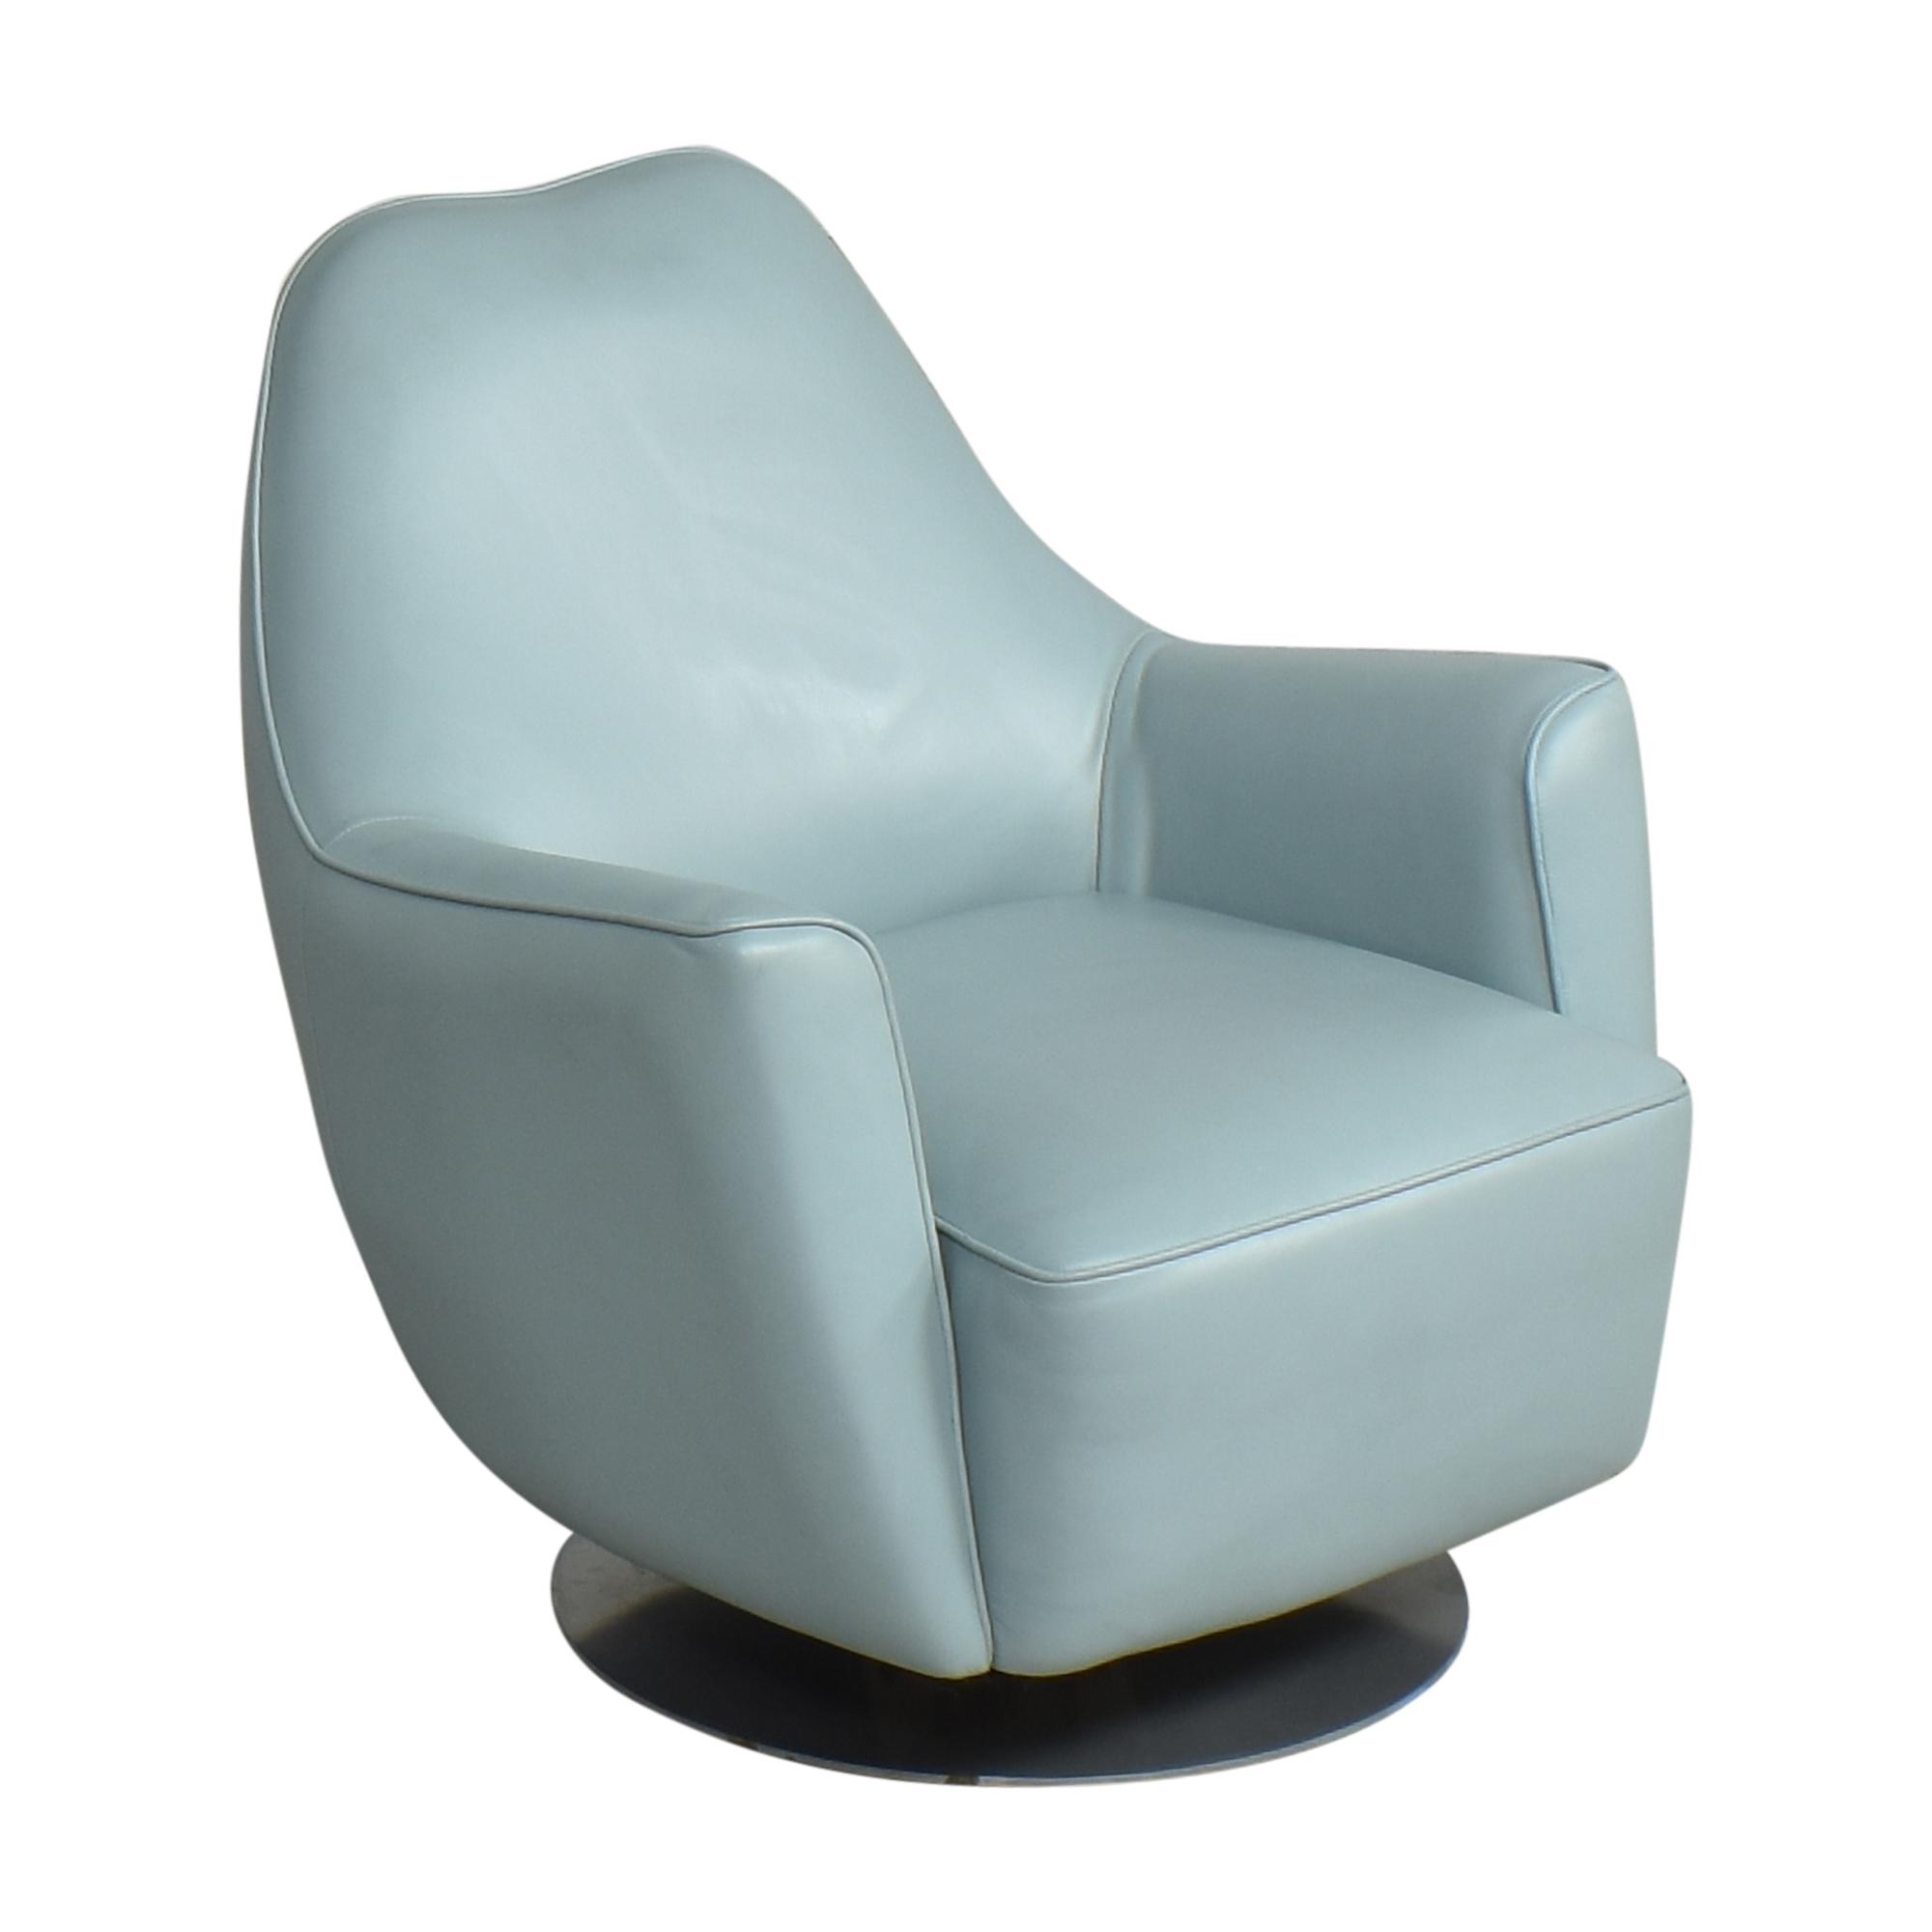 Room & Board Room & Board Modern Swivel Chair Chairs